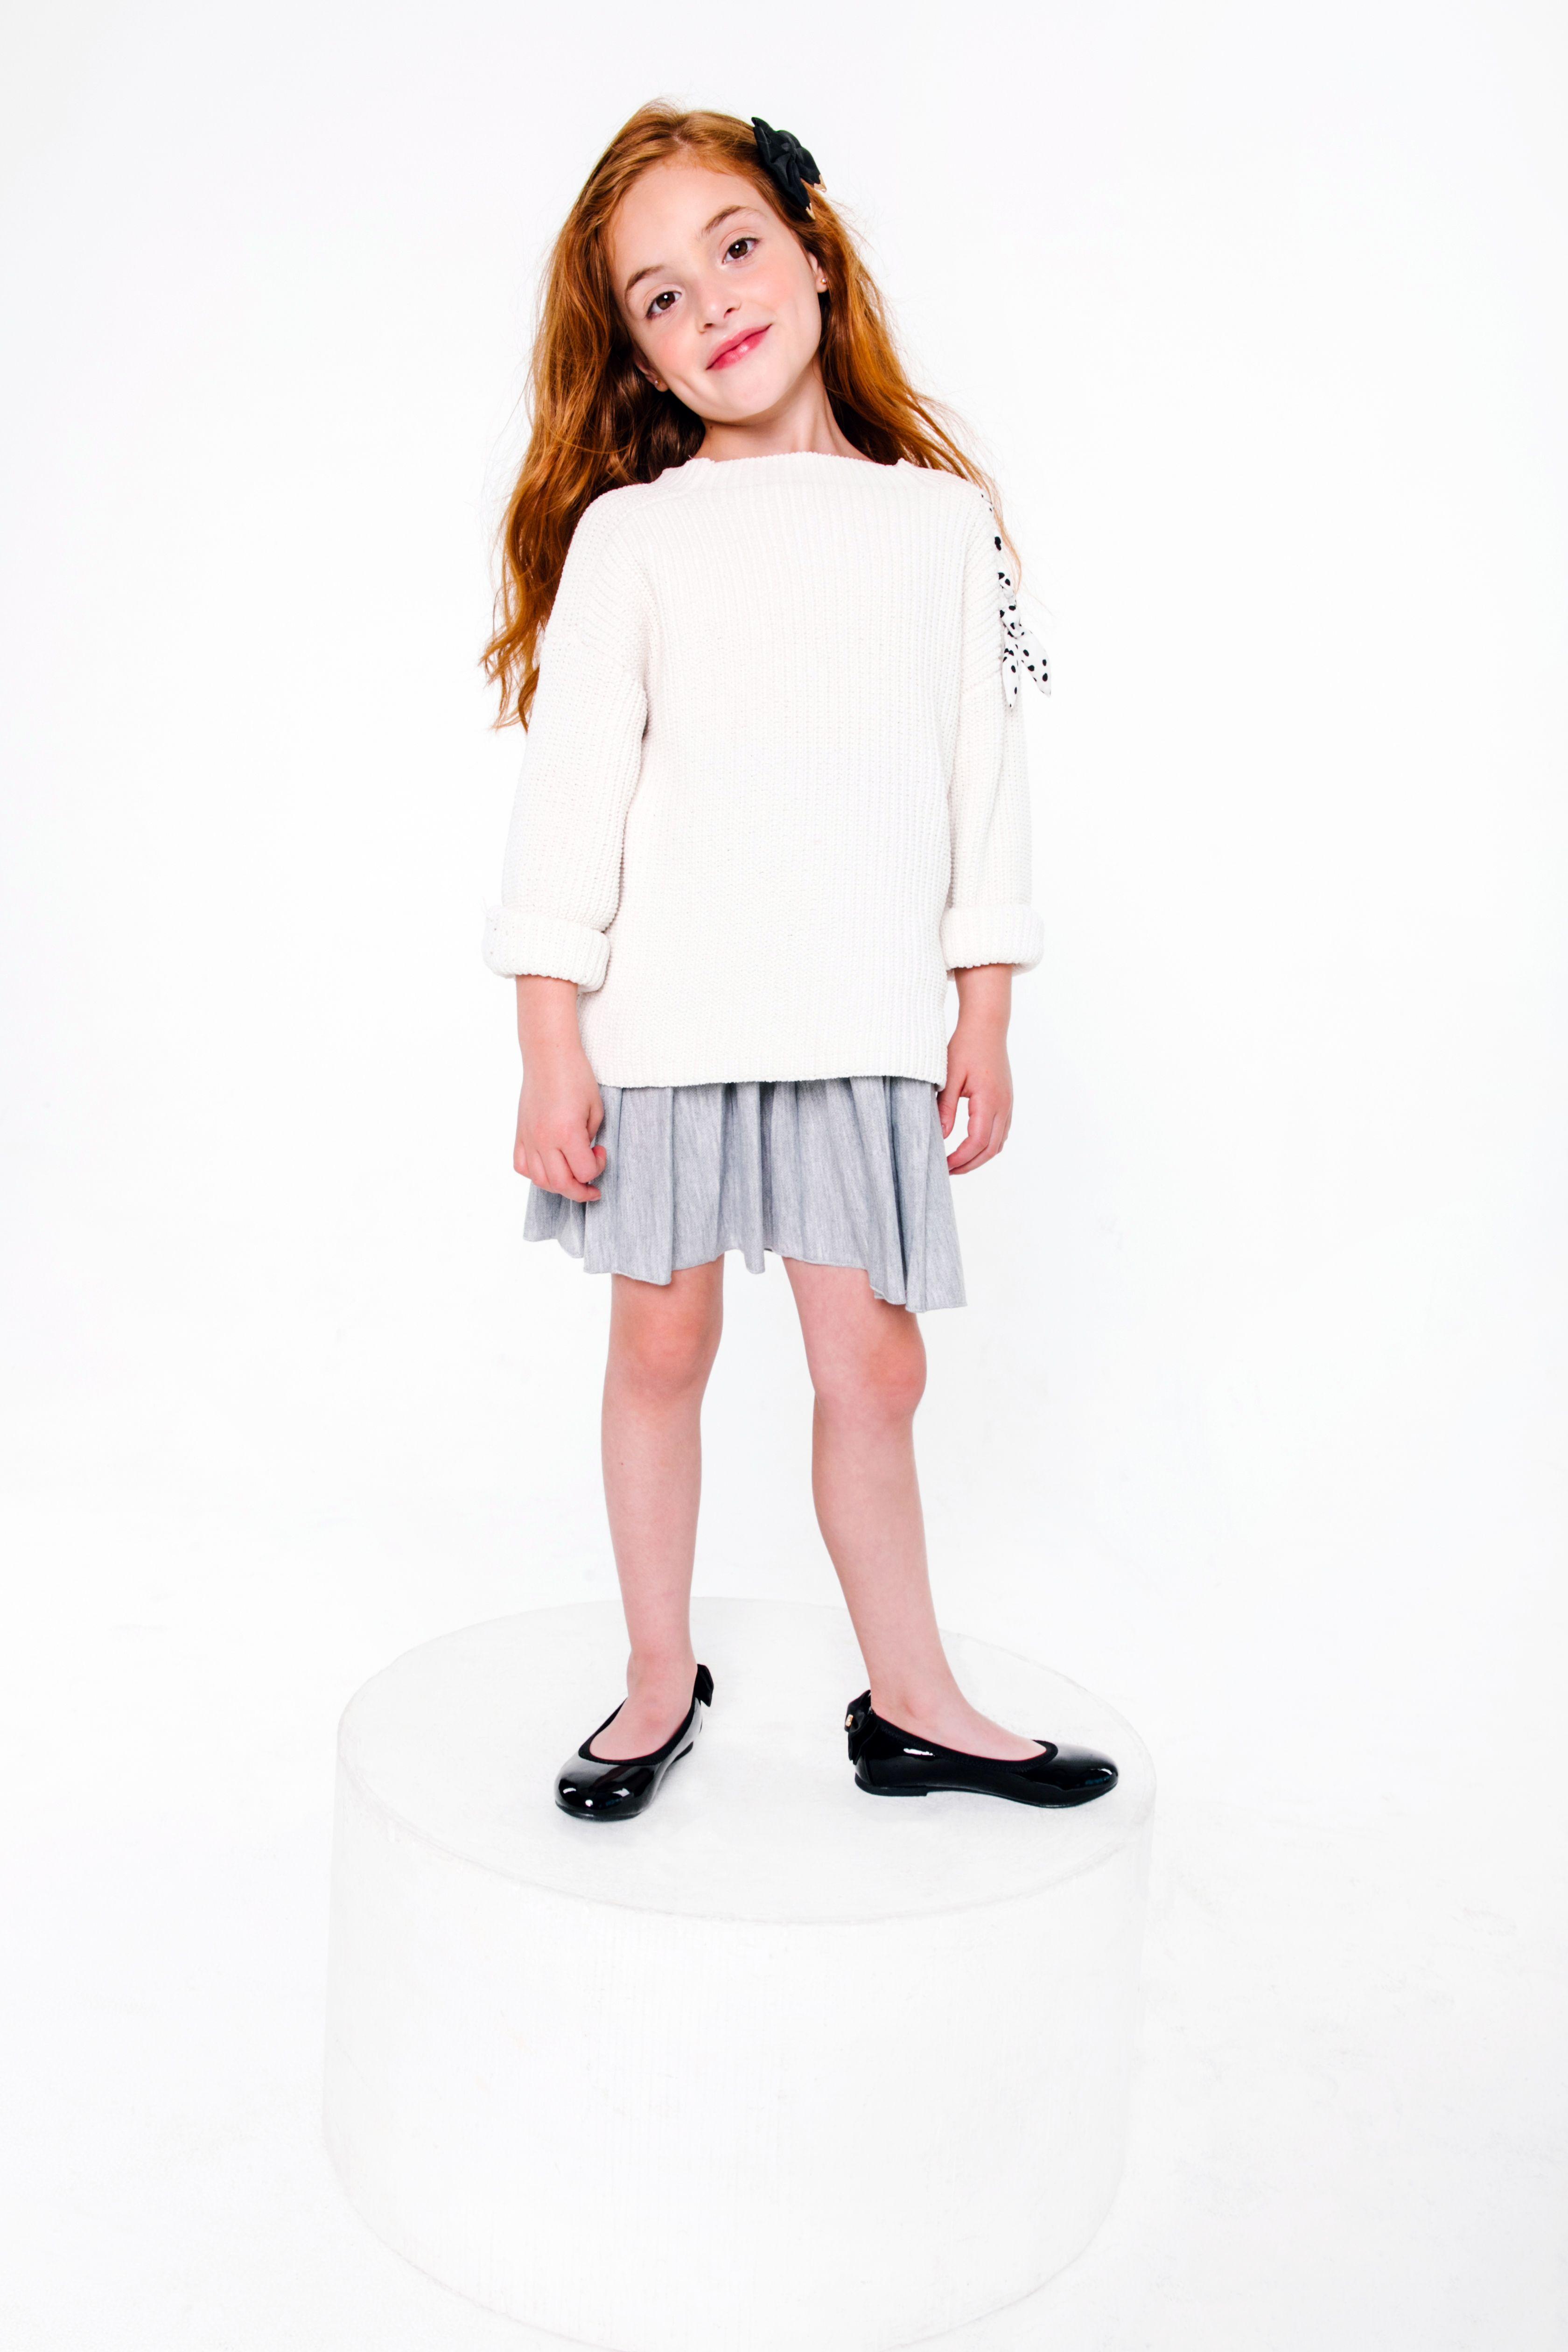 90be340d3b801 Felicia Esmerelda (Youth) | Transitional Pieces | Girls ballet flats ...